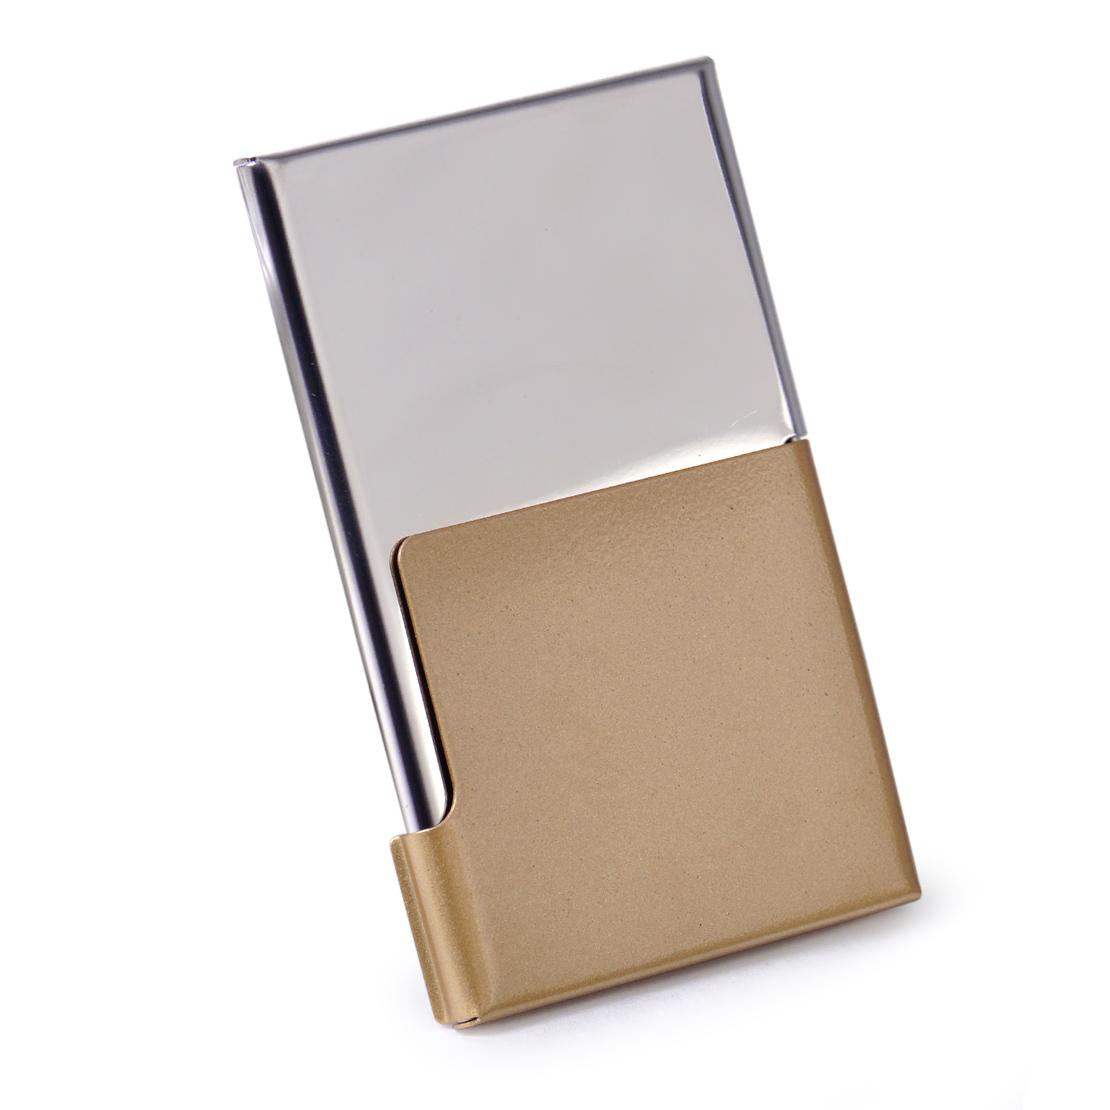 New Fashion Business Card Case Name ID Holder Pocket Box